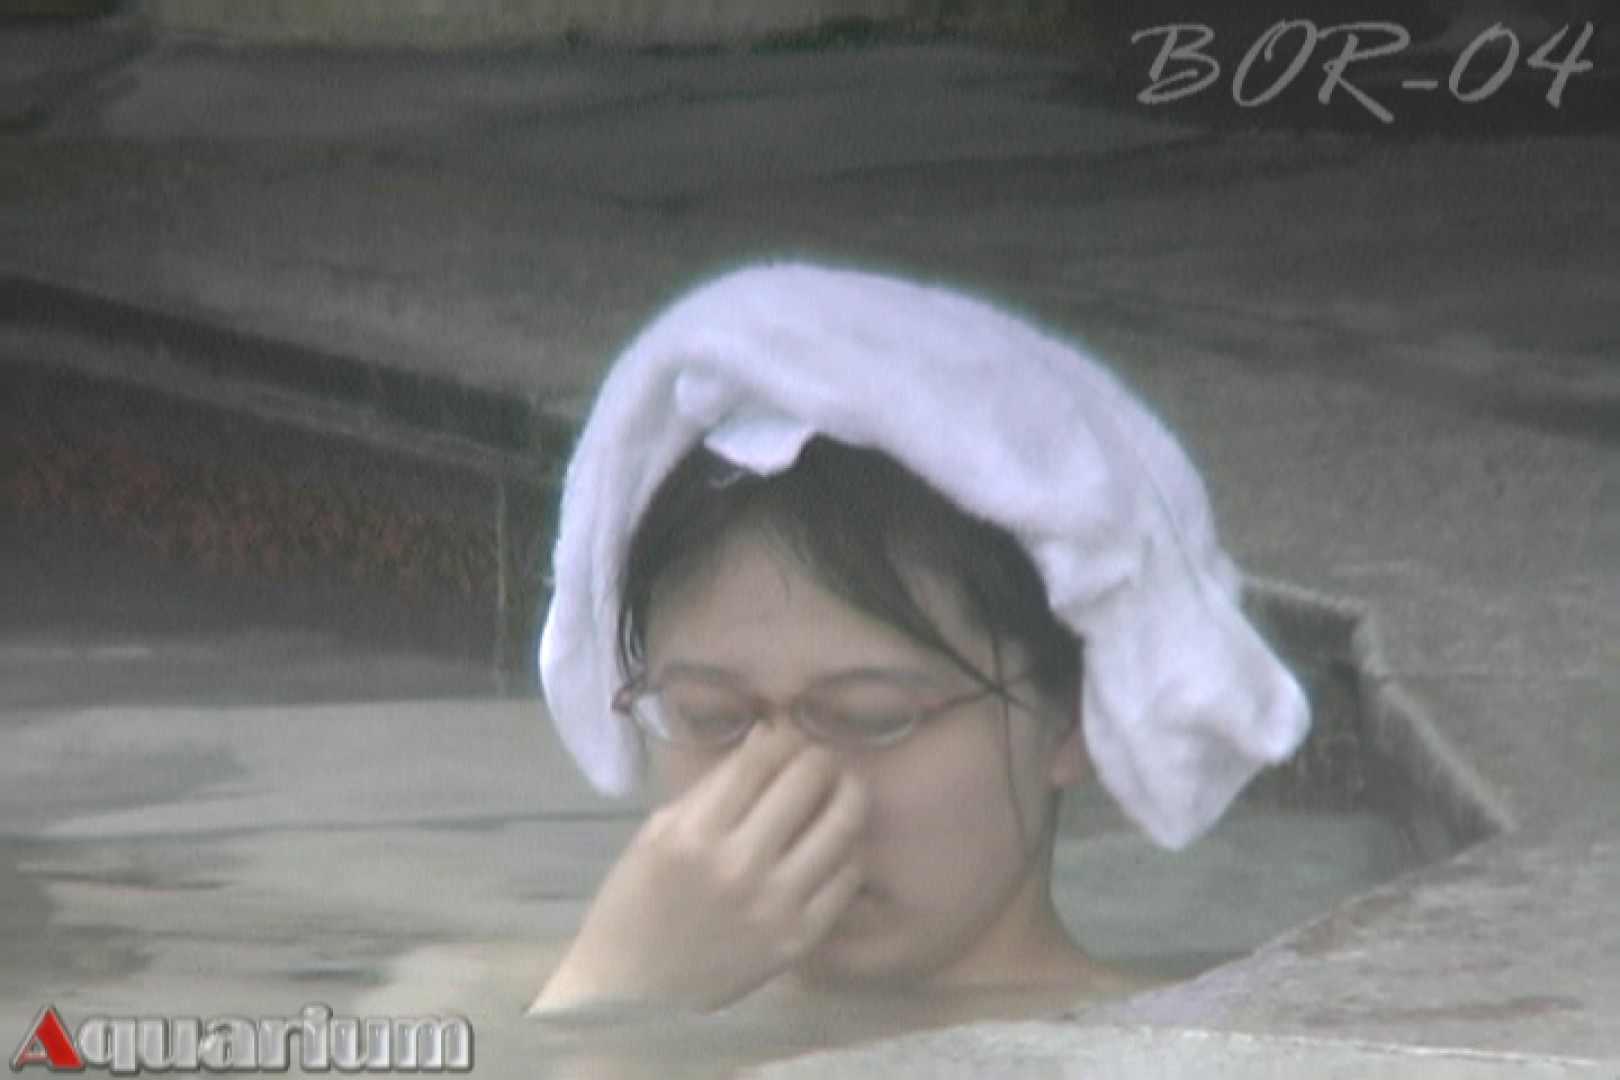 Aquaな露天風呂Vol.507 露天 ワレメ無修正動画無料 84画像 68